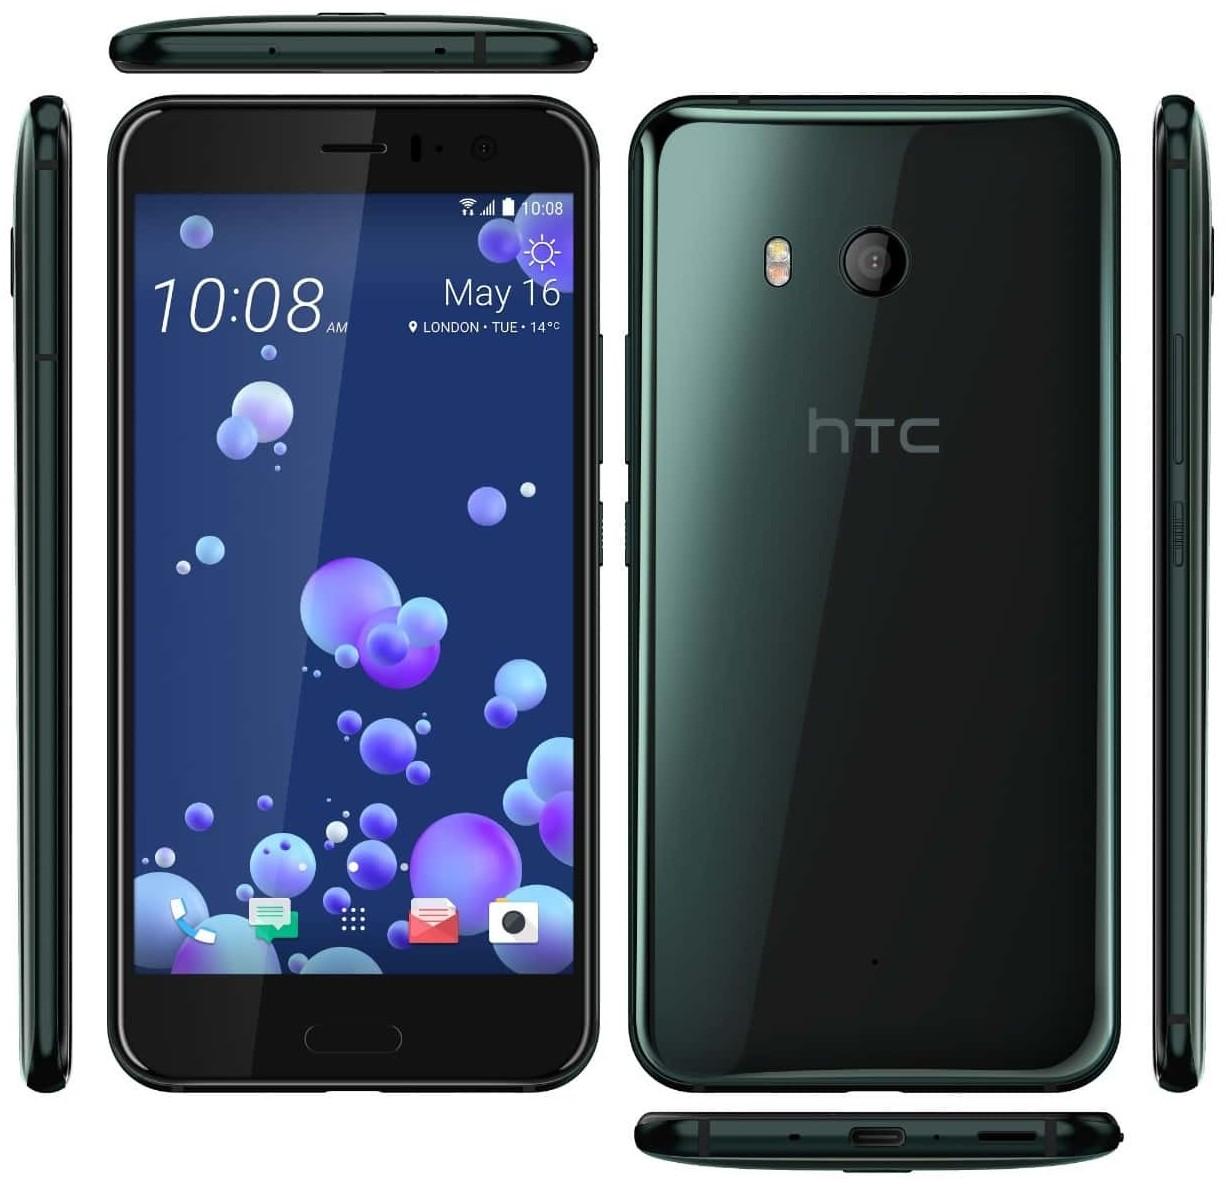 HTC U11 Global 128GB Dual SIM - Specs and Price - Phonegg